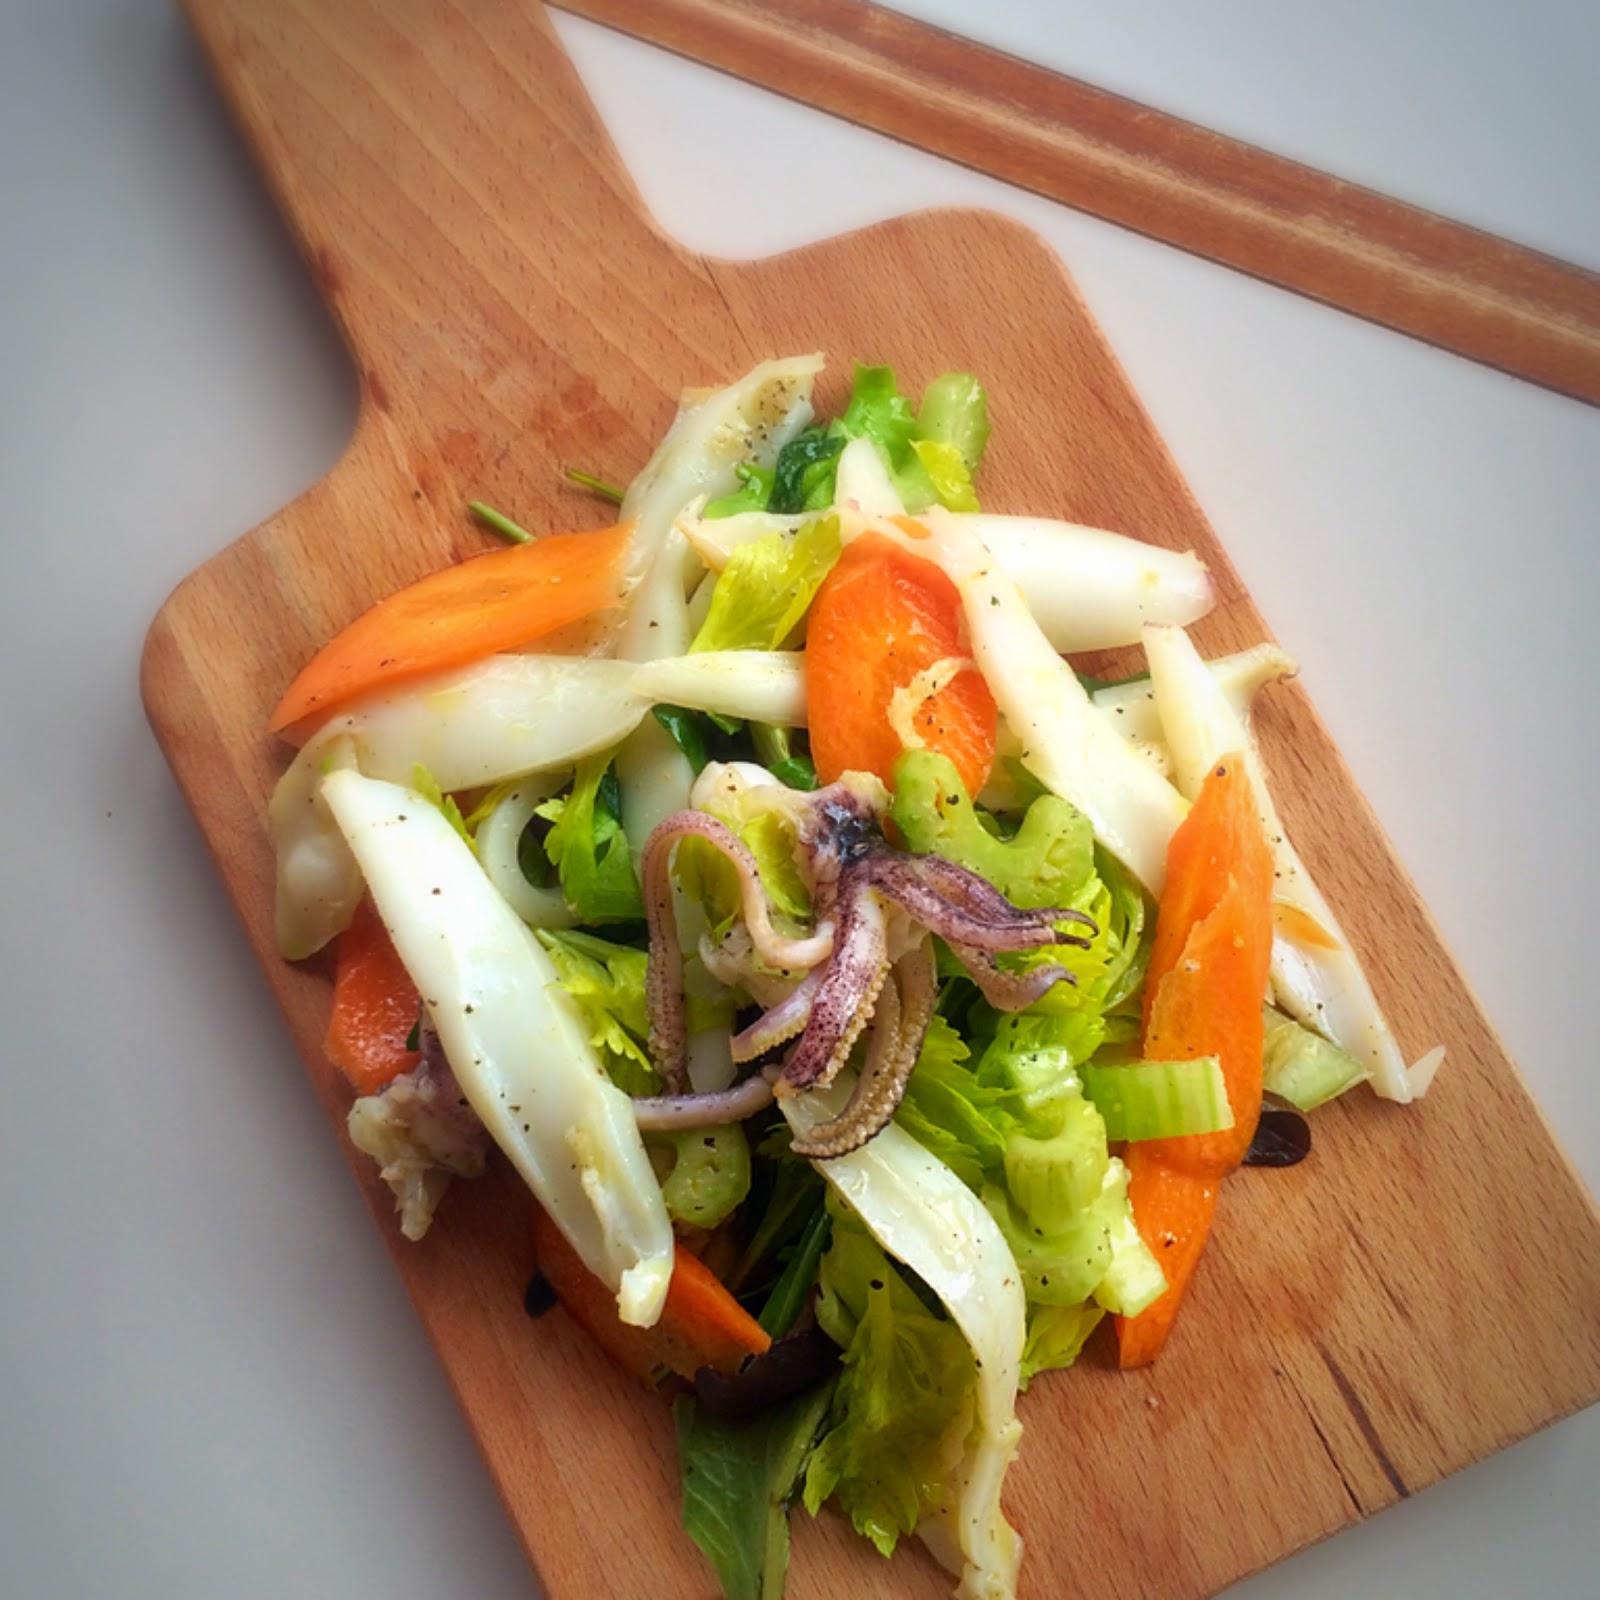 ricetta Insalata calamaro sedano carota